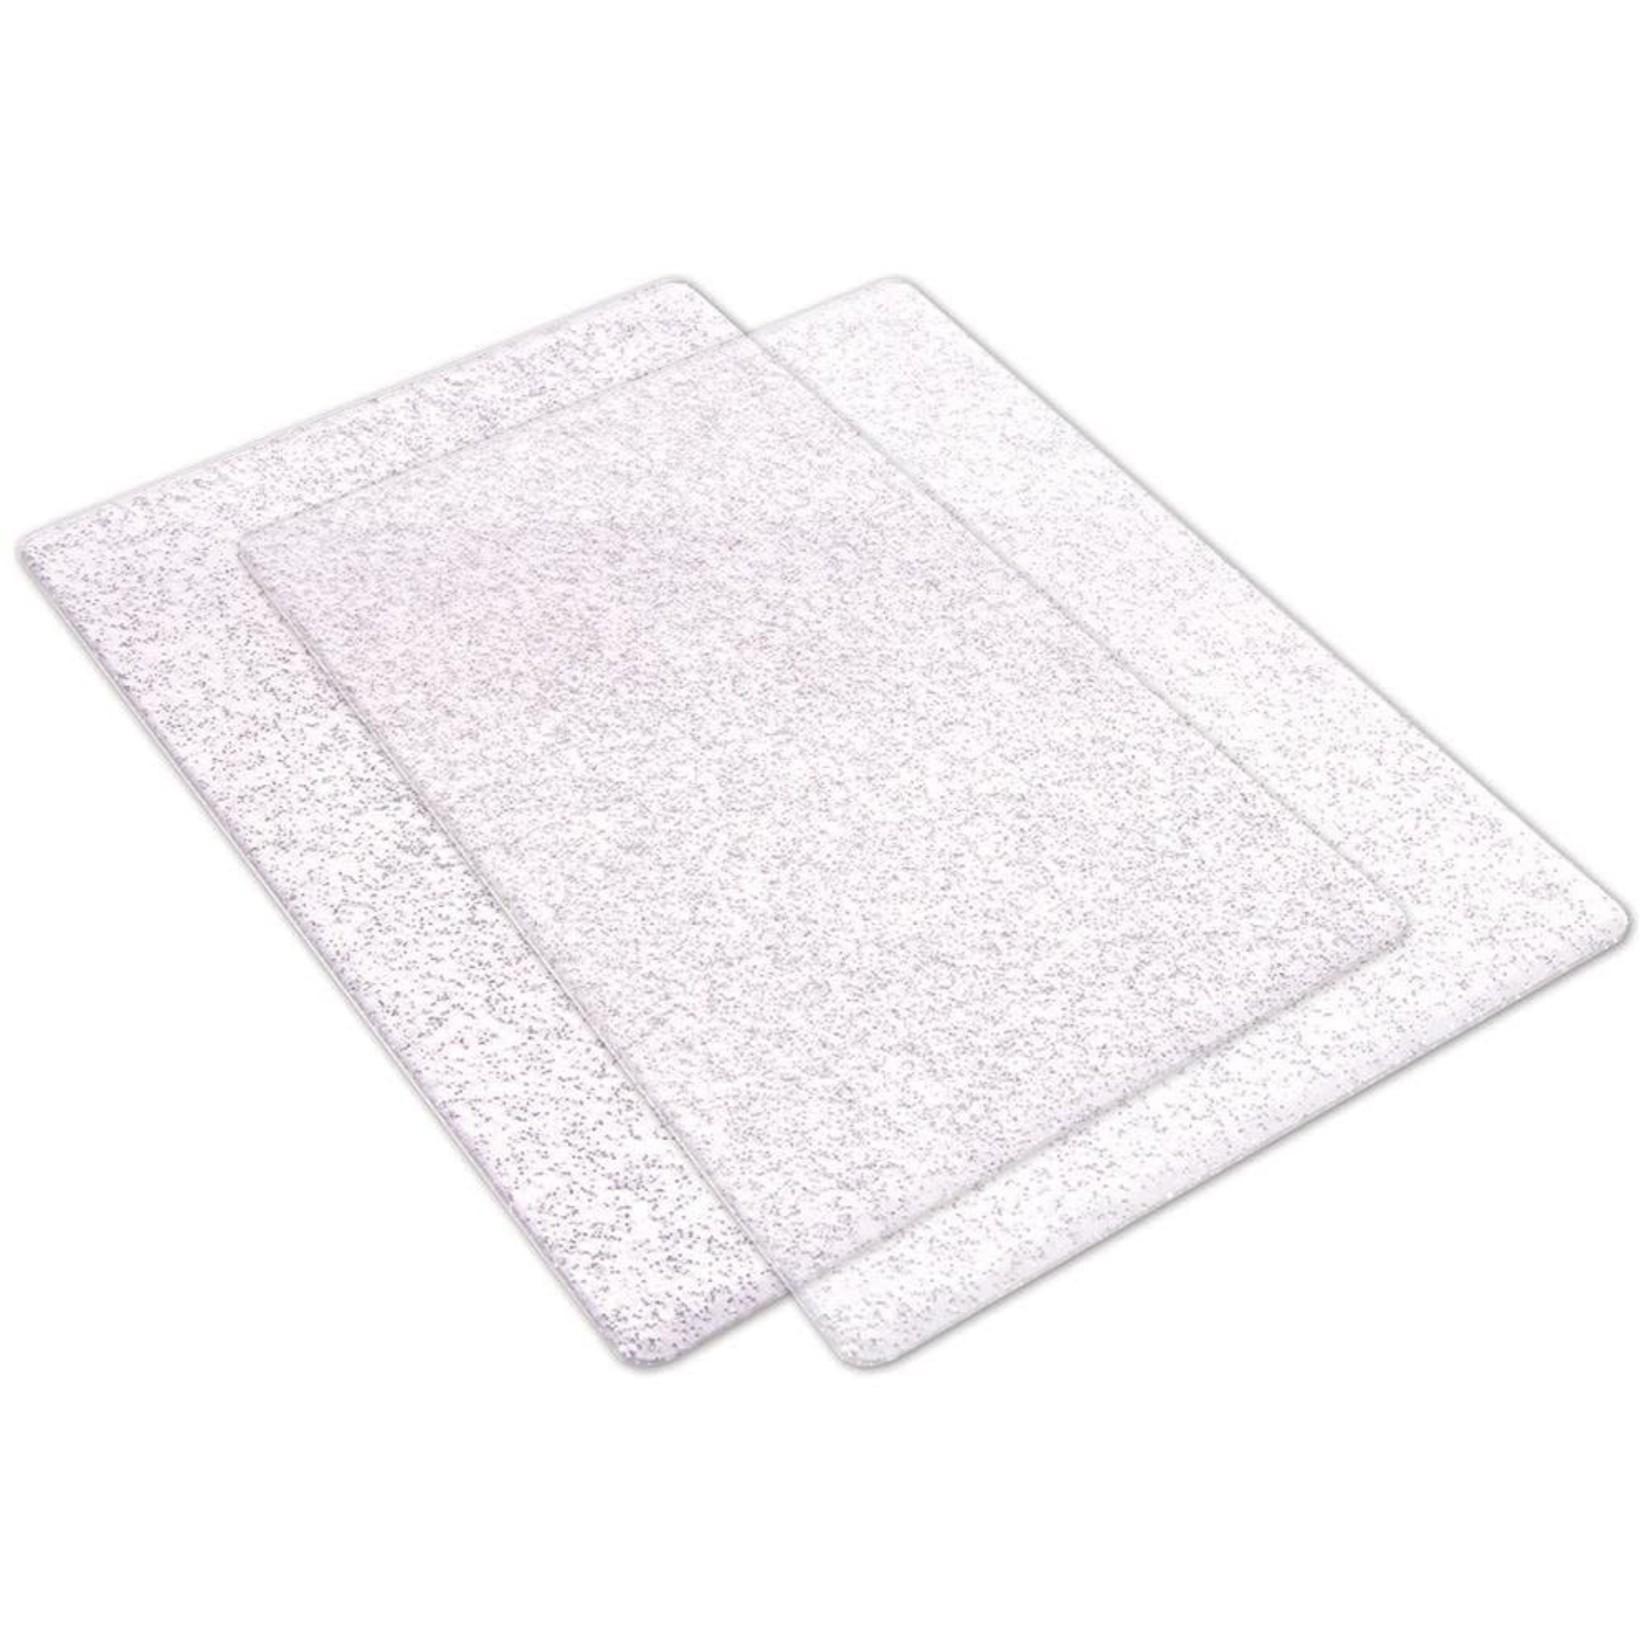 Sizzix Sizzix - Glitter Cutting Pads Standard - Silver